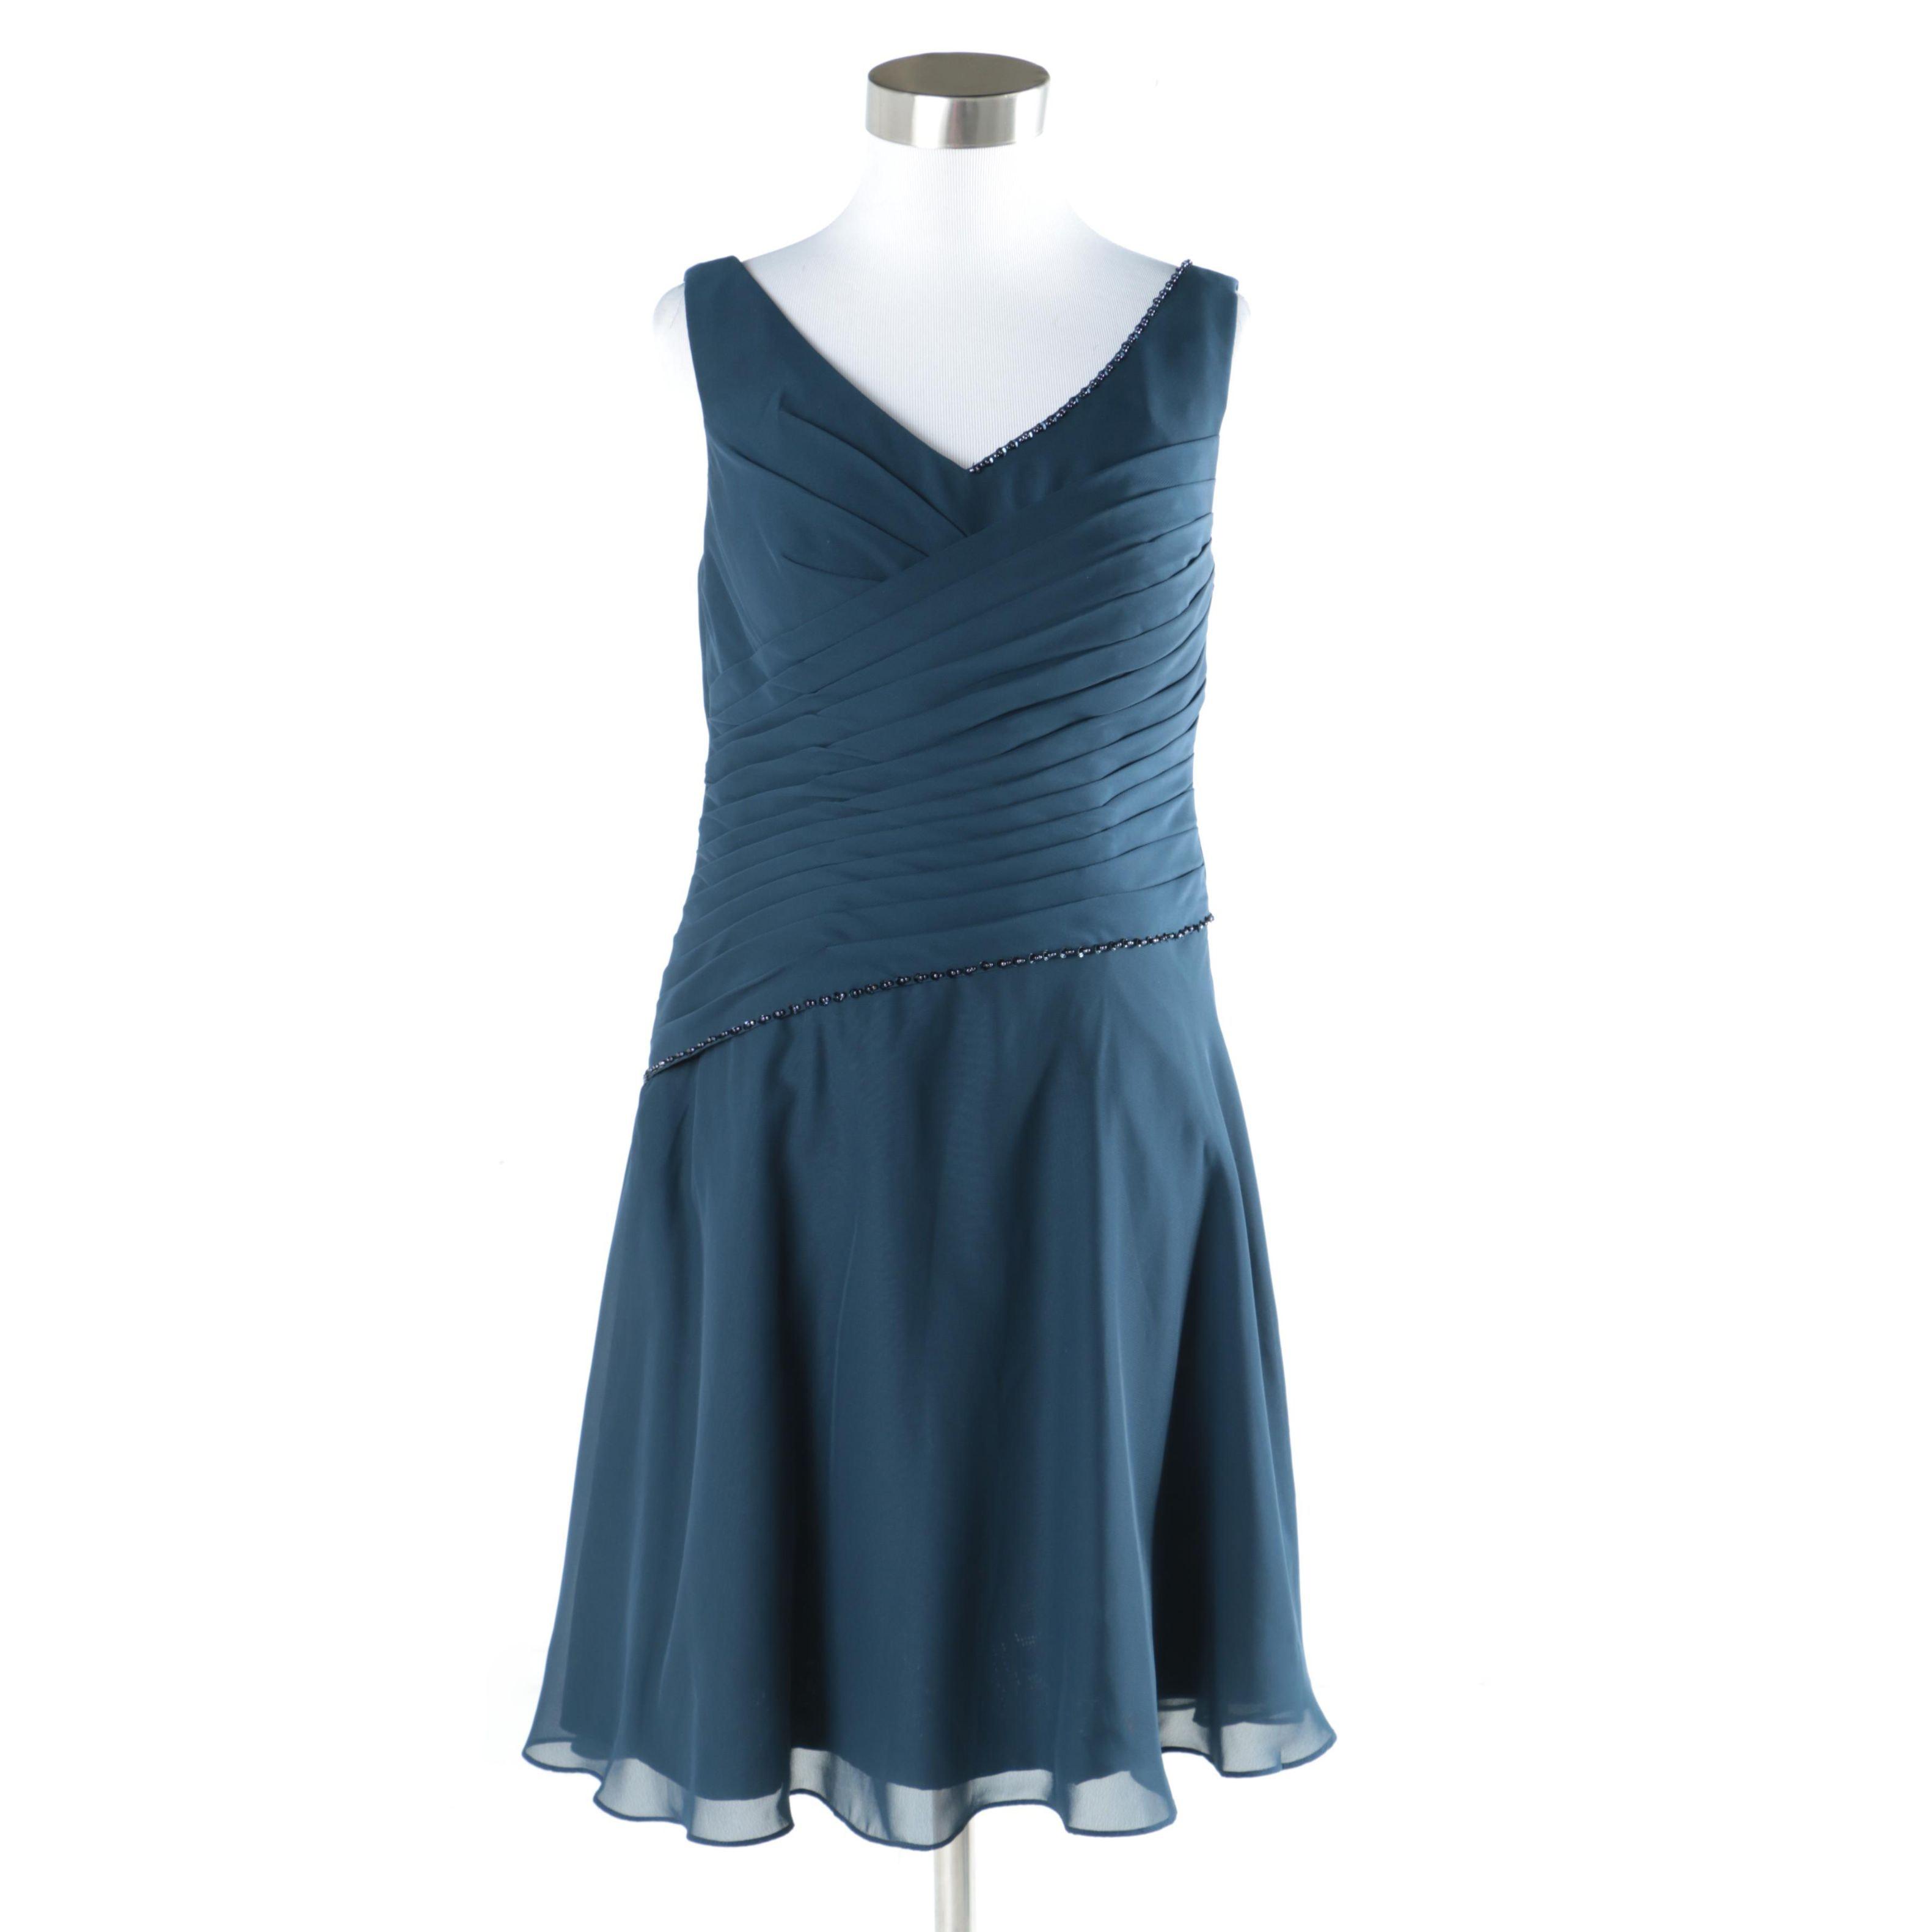 JJ's House Blue Chiffon Beaded Dress